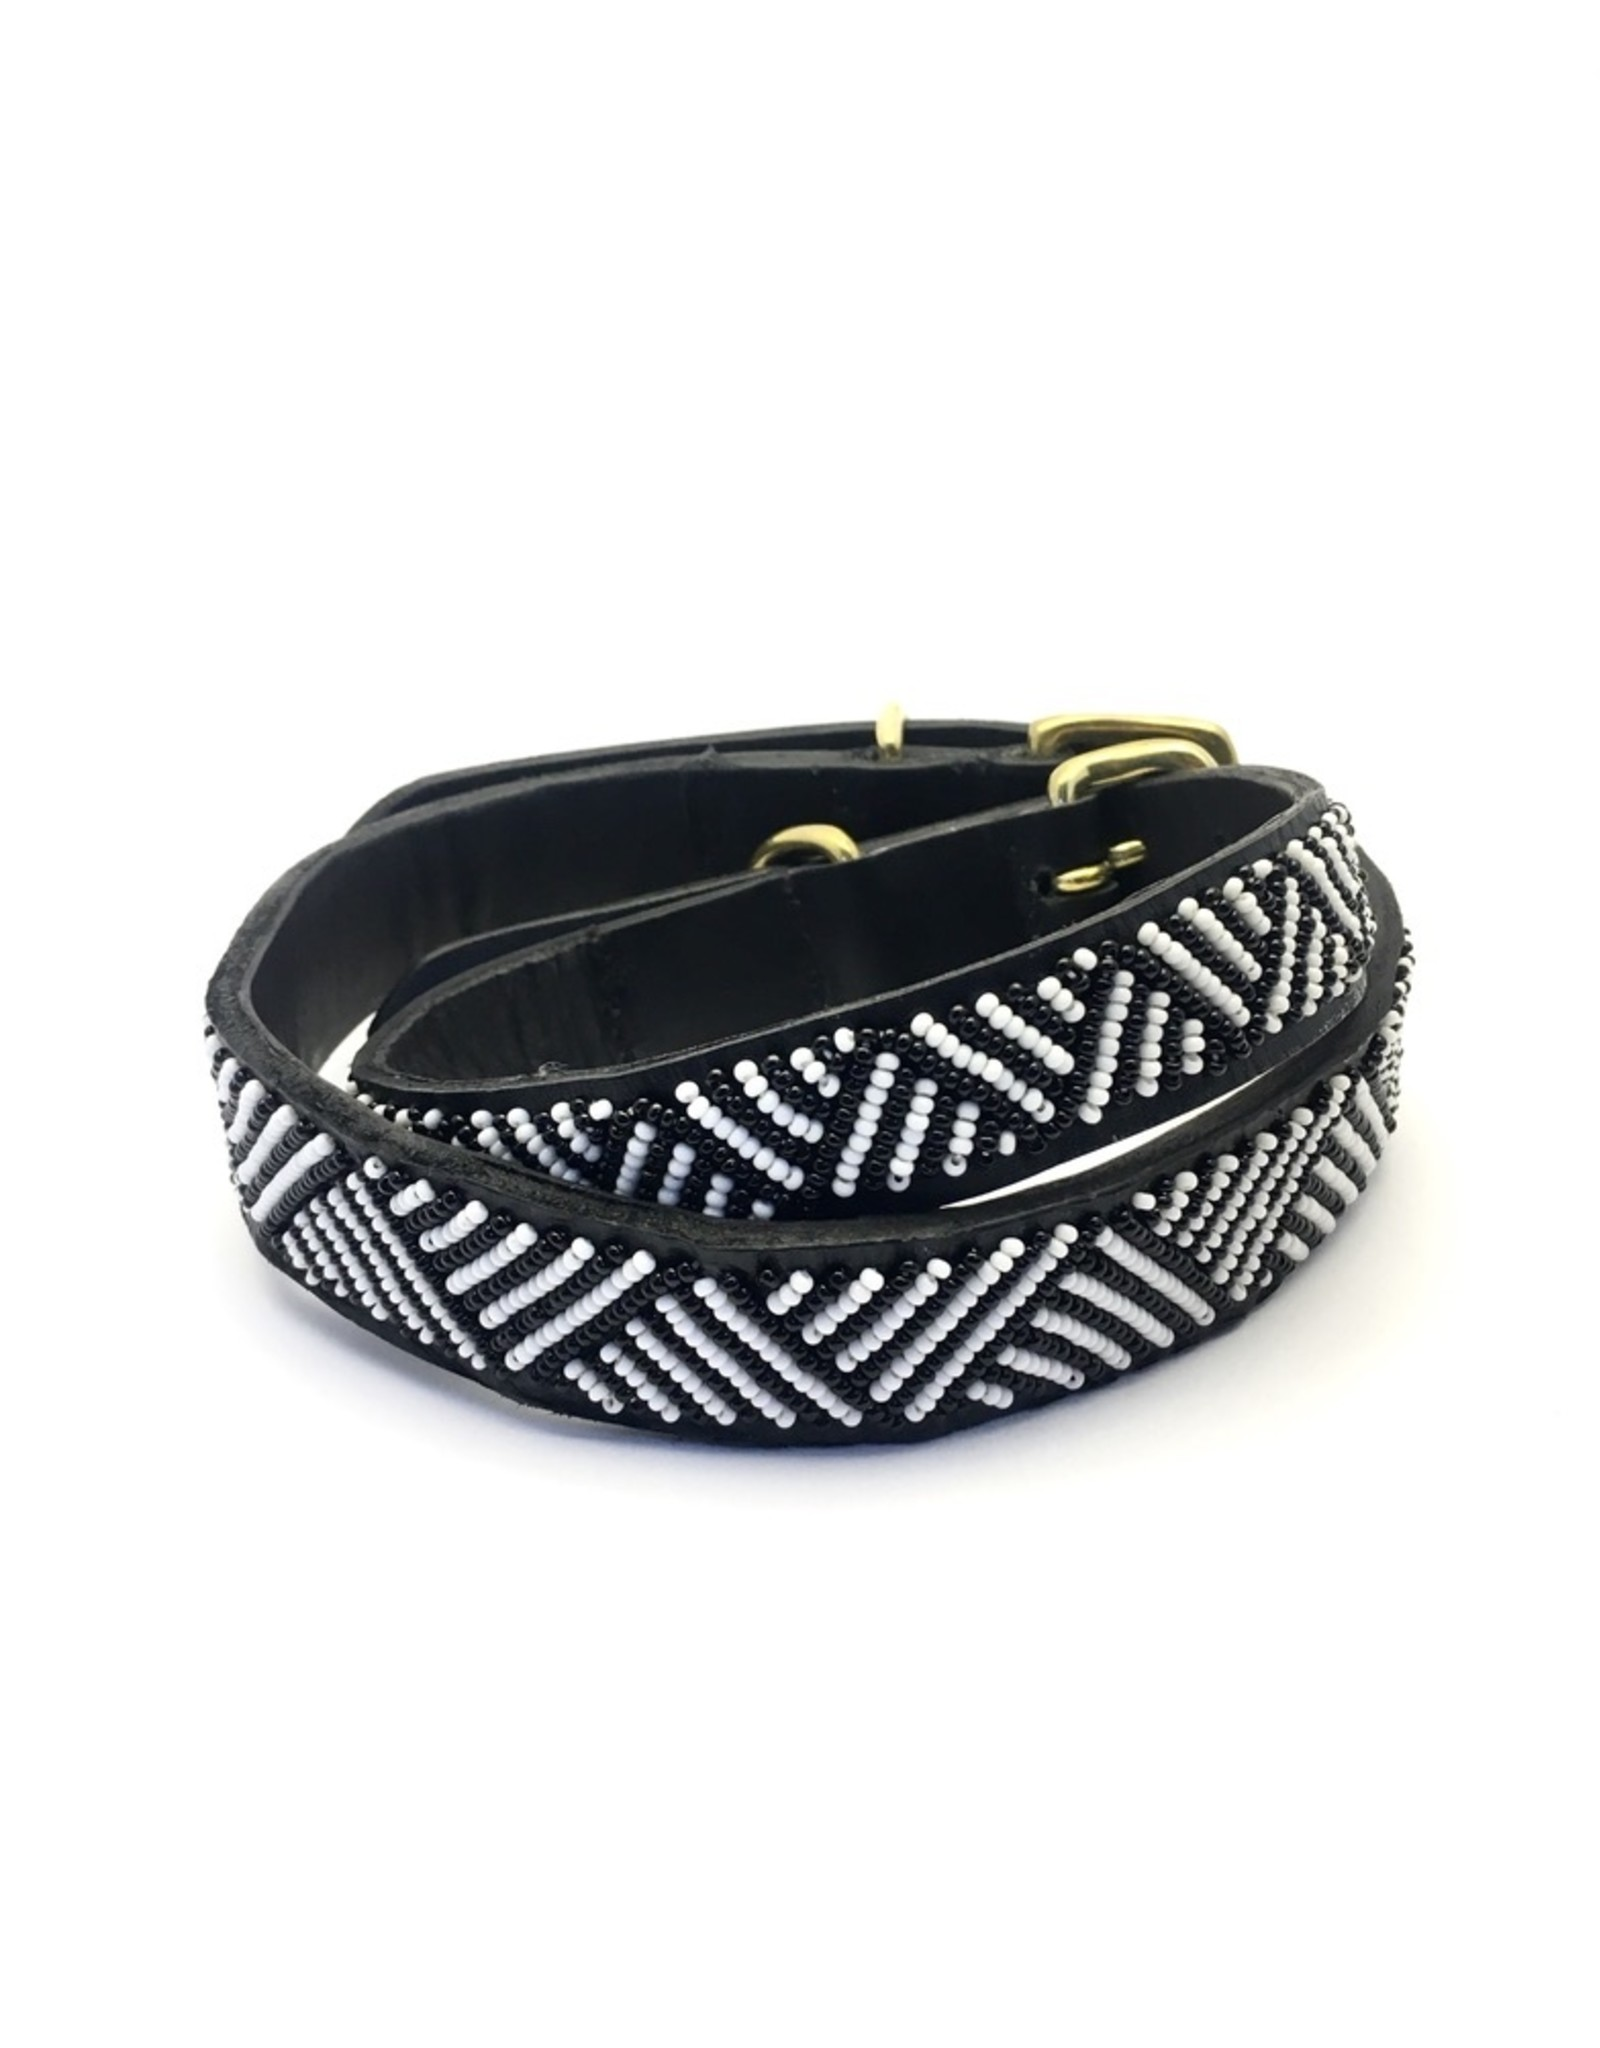 Maisha.Style Dog lead Elisa - black leather Maasai lead with black and white beads